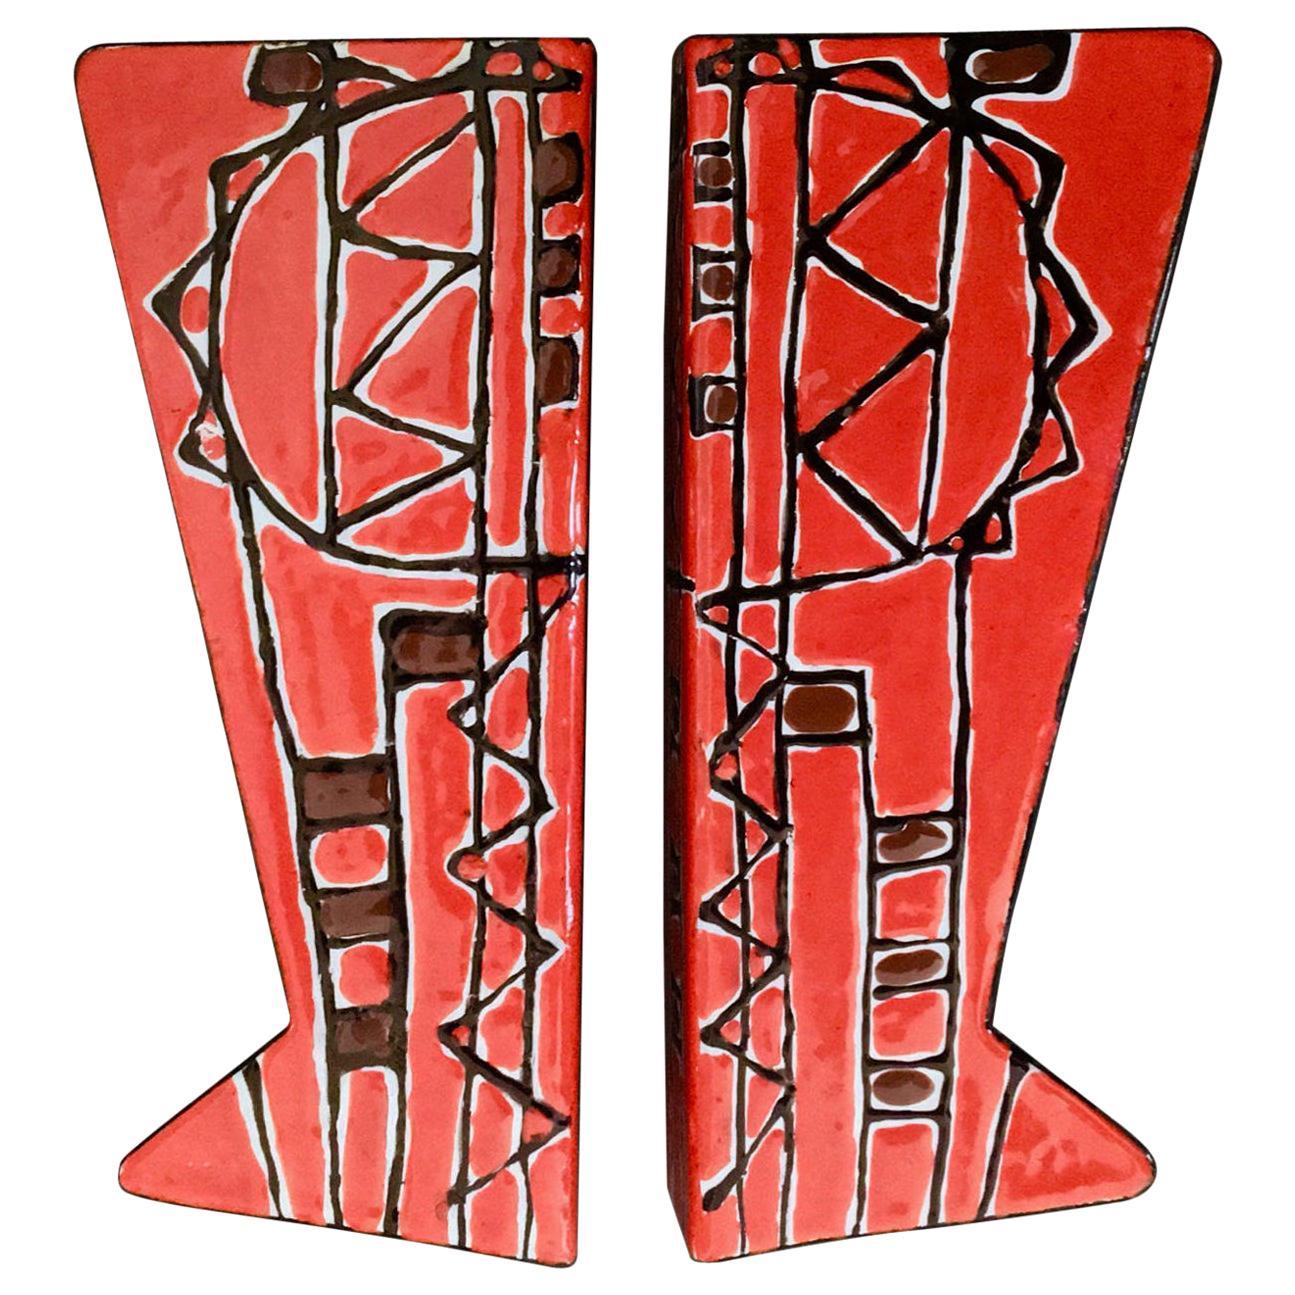 Pair of Door Handles in Red Enamel attr Siva Poggibonsi, Italy, Mid-20th Century